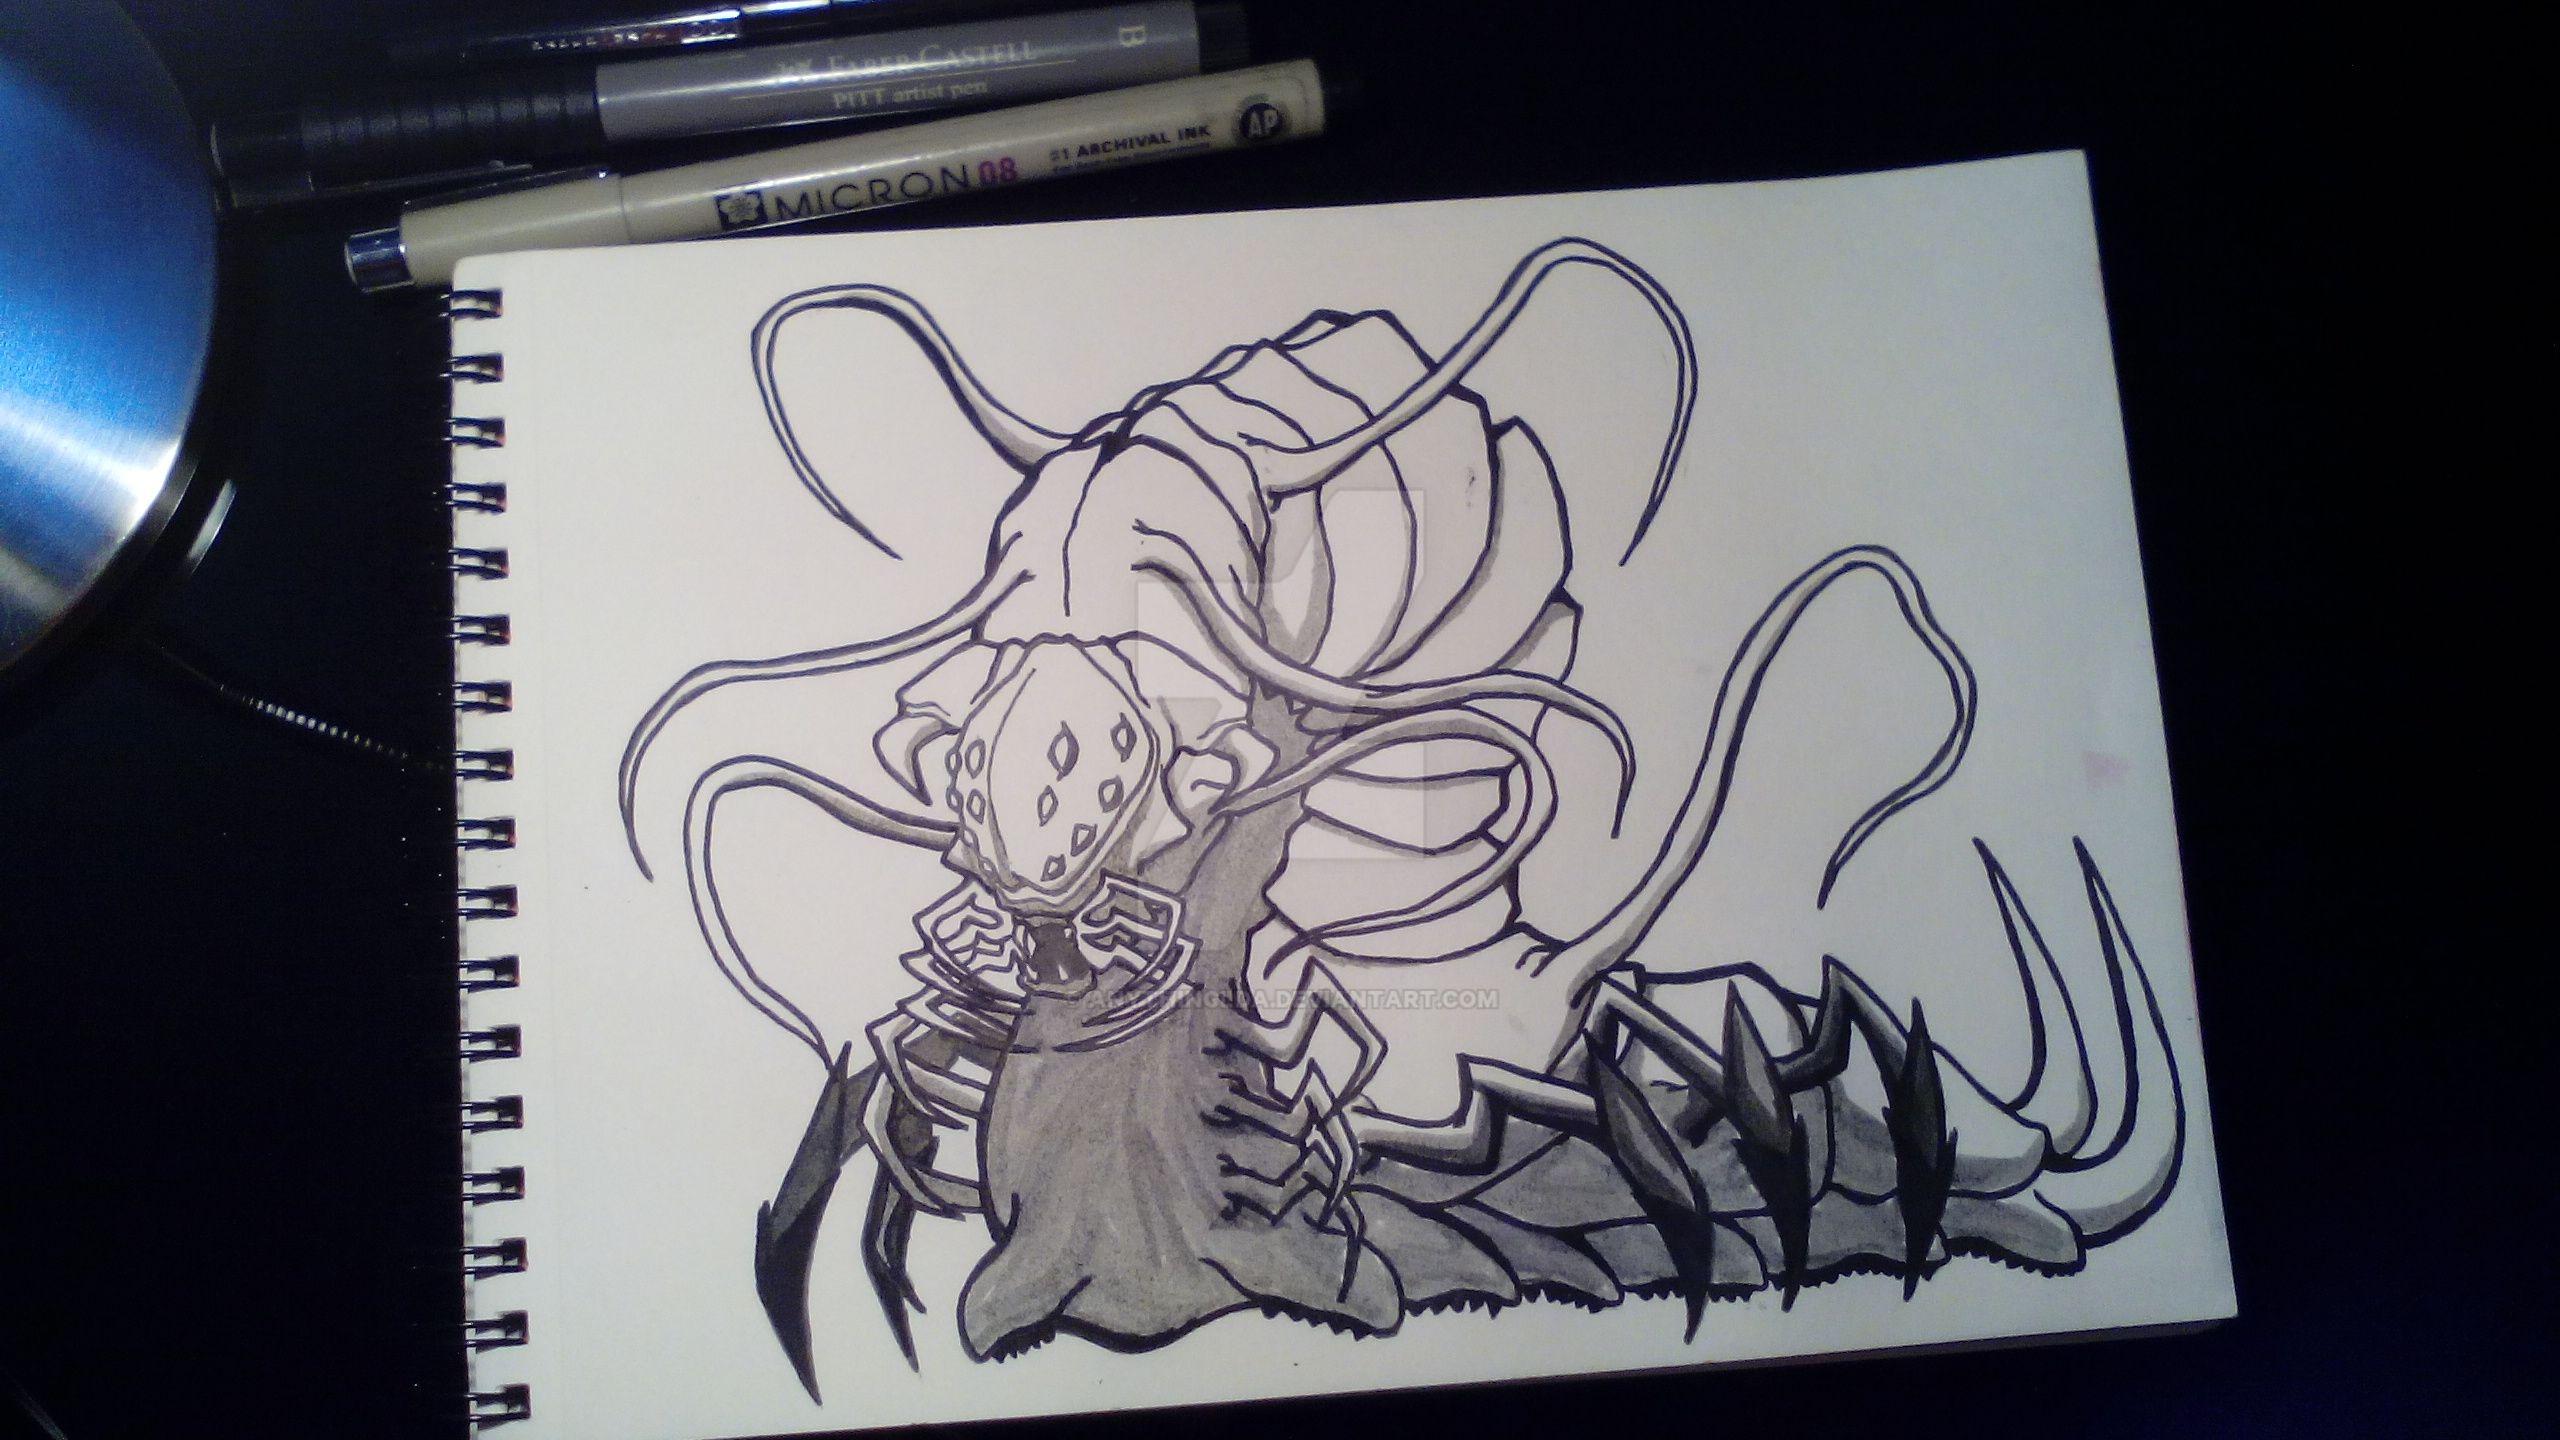 Predator Caterpillar by anythingLDA